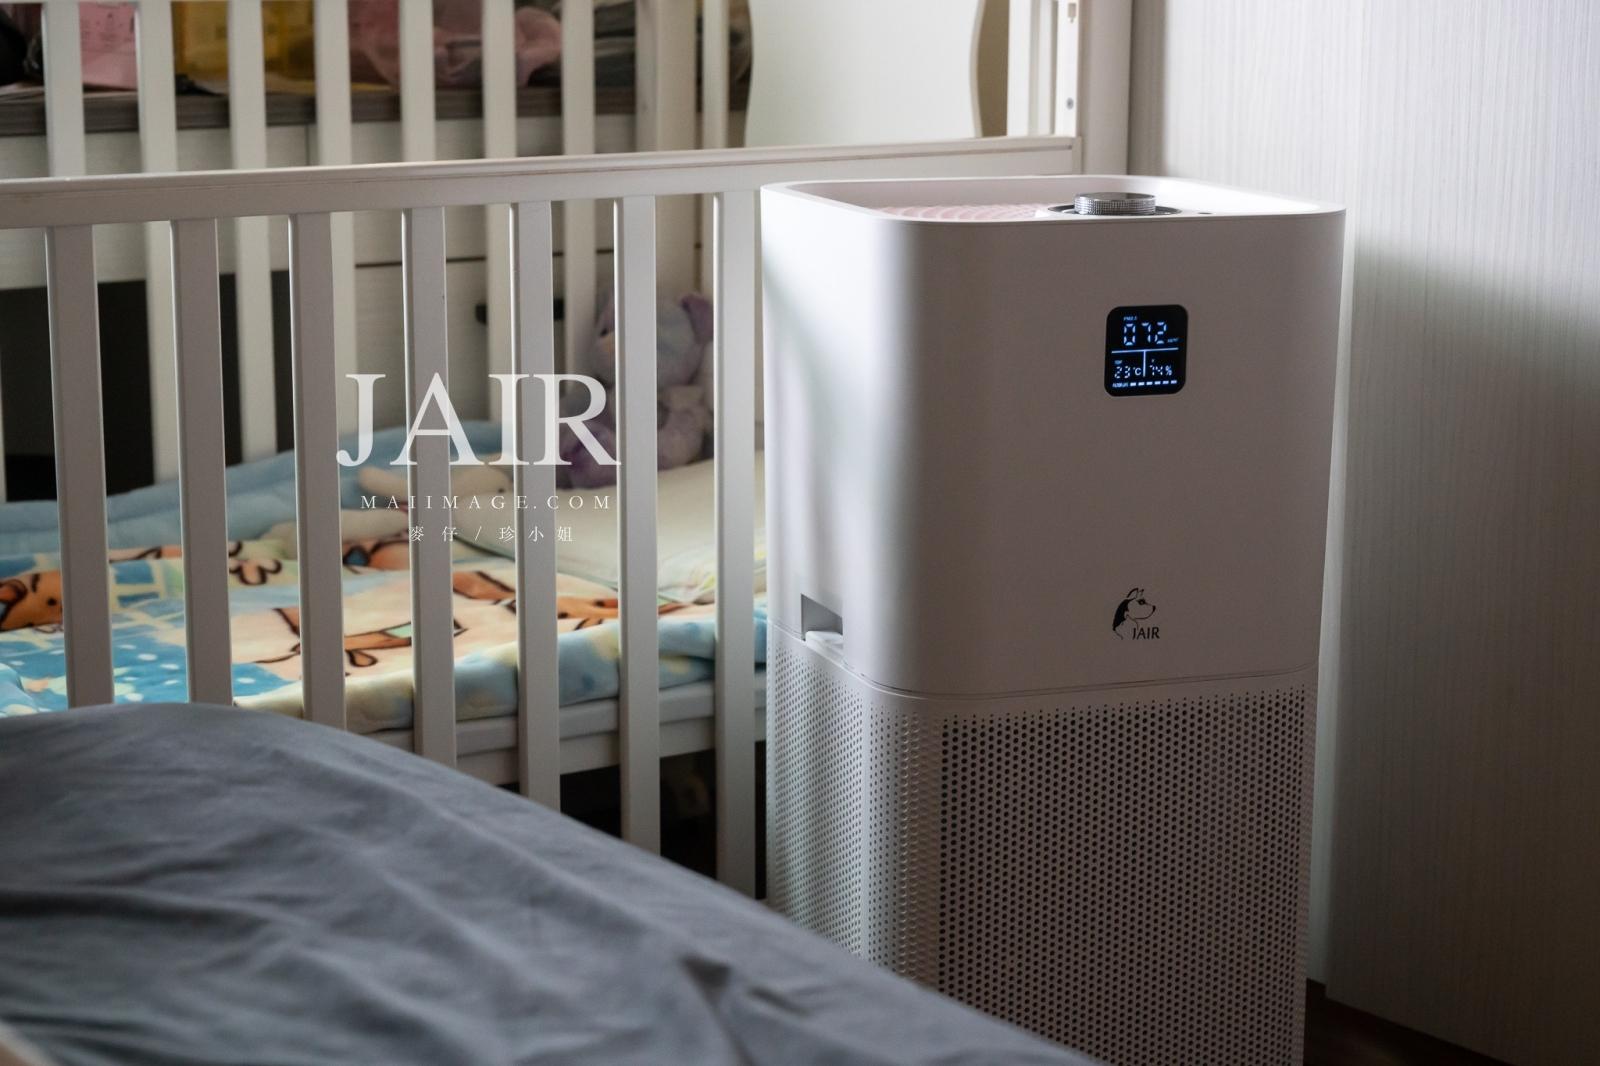 JAIR 空氣清淨機